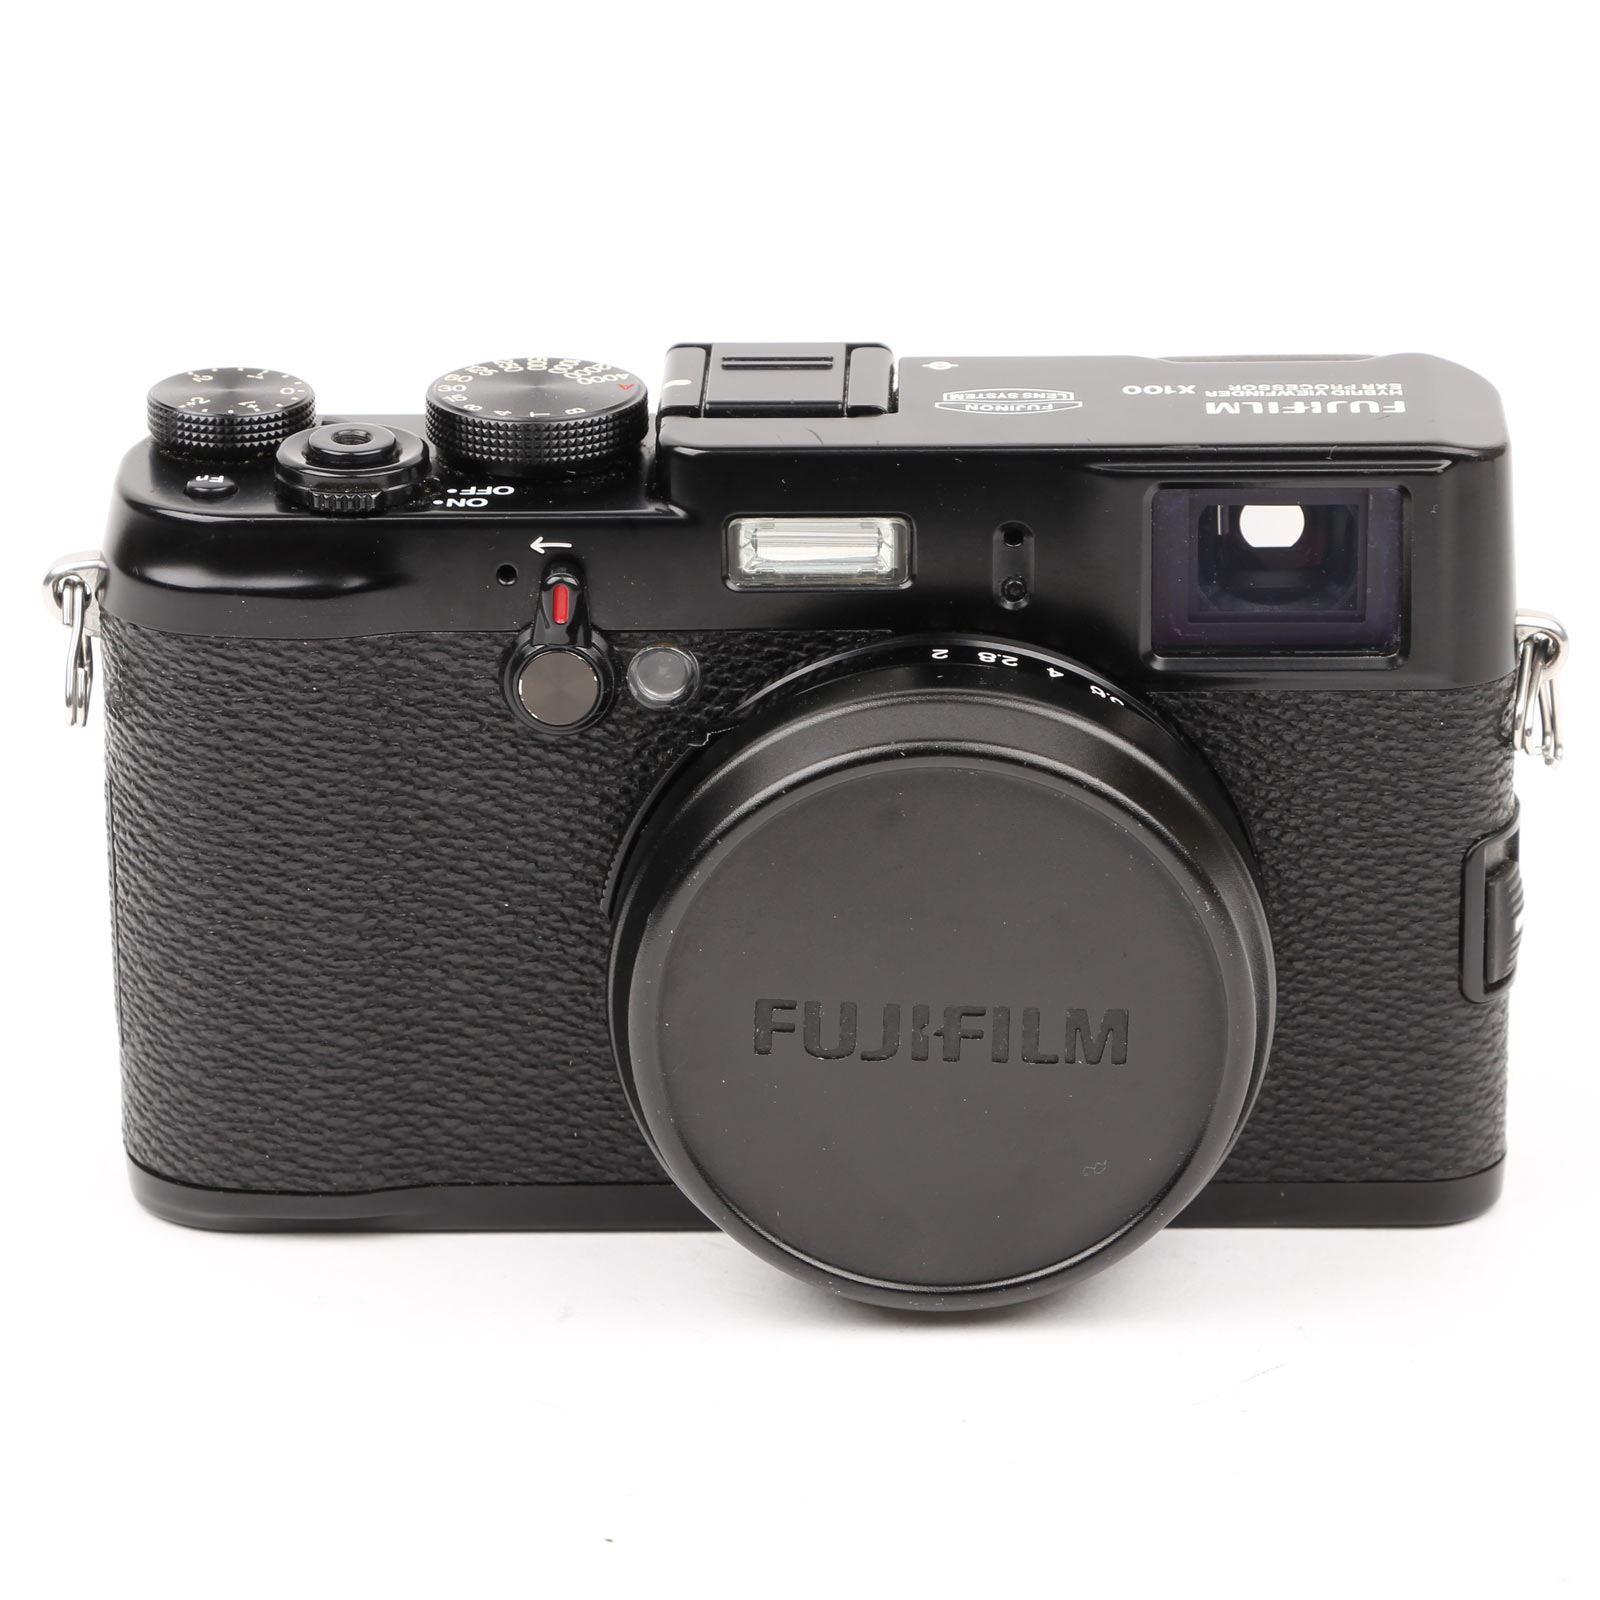 Used Fuji FinePix X100 Black Digital Camera - Special Edition